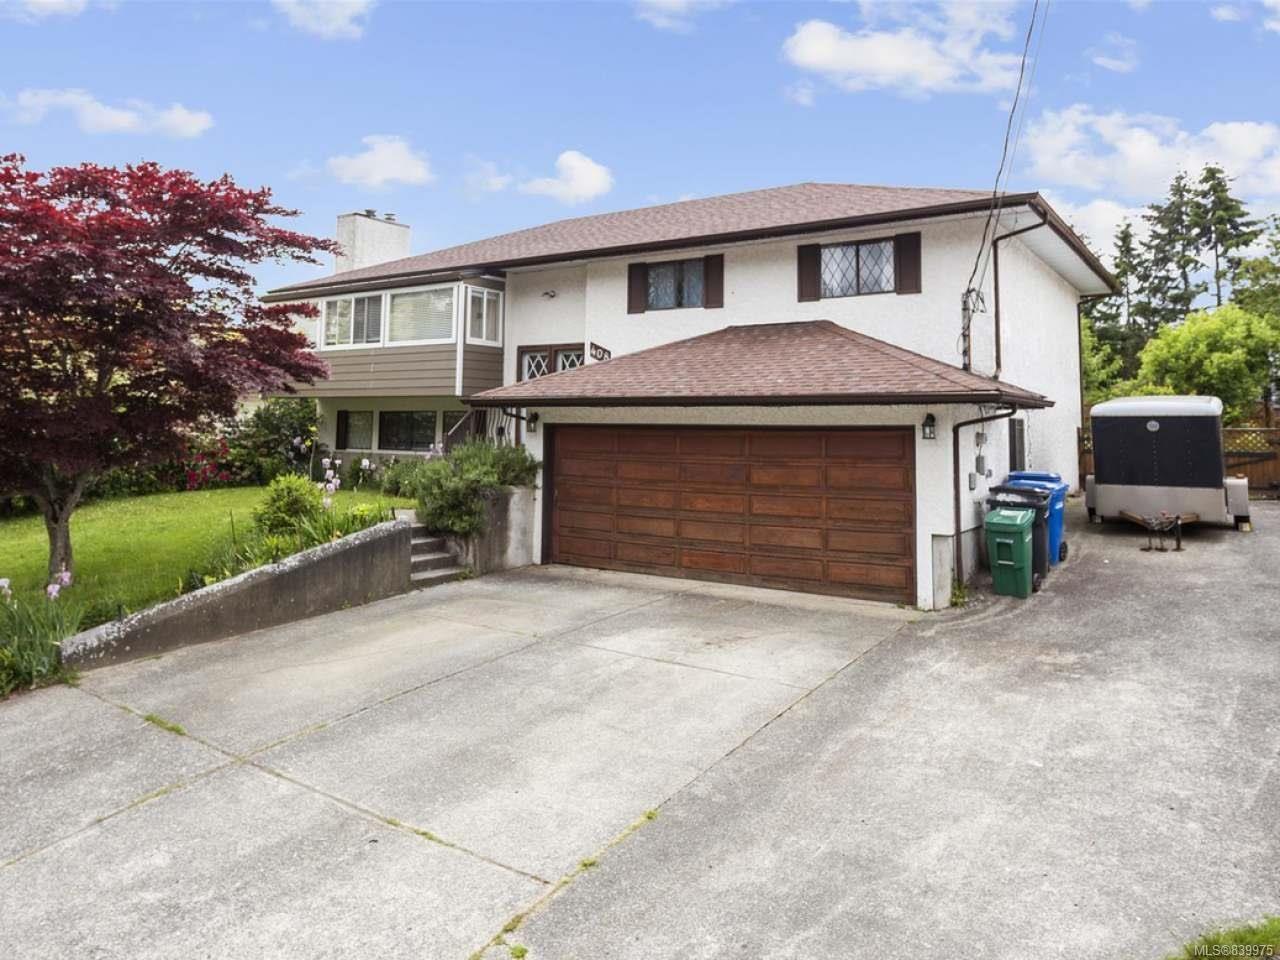 Main Photo: 408 Stable Pl in NANAIMO: Na Diver Lake House for sale (Nanaimo)  : MLS®# 839975